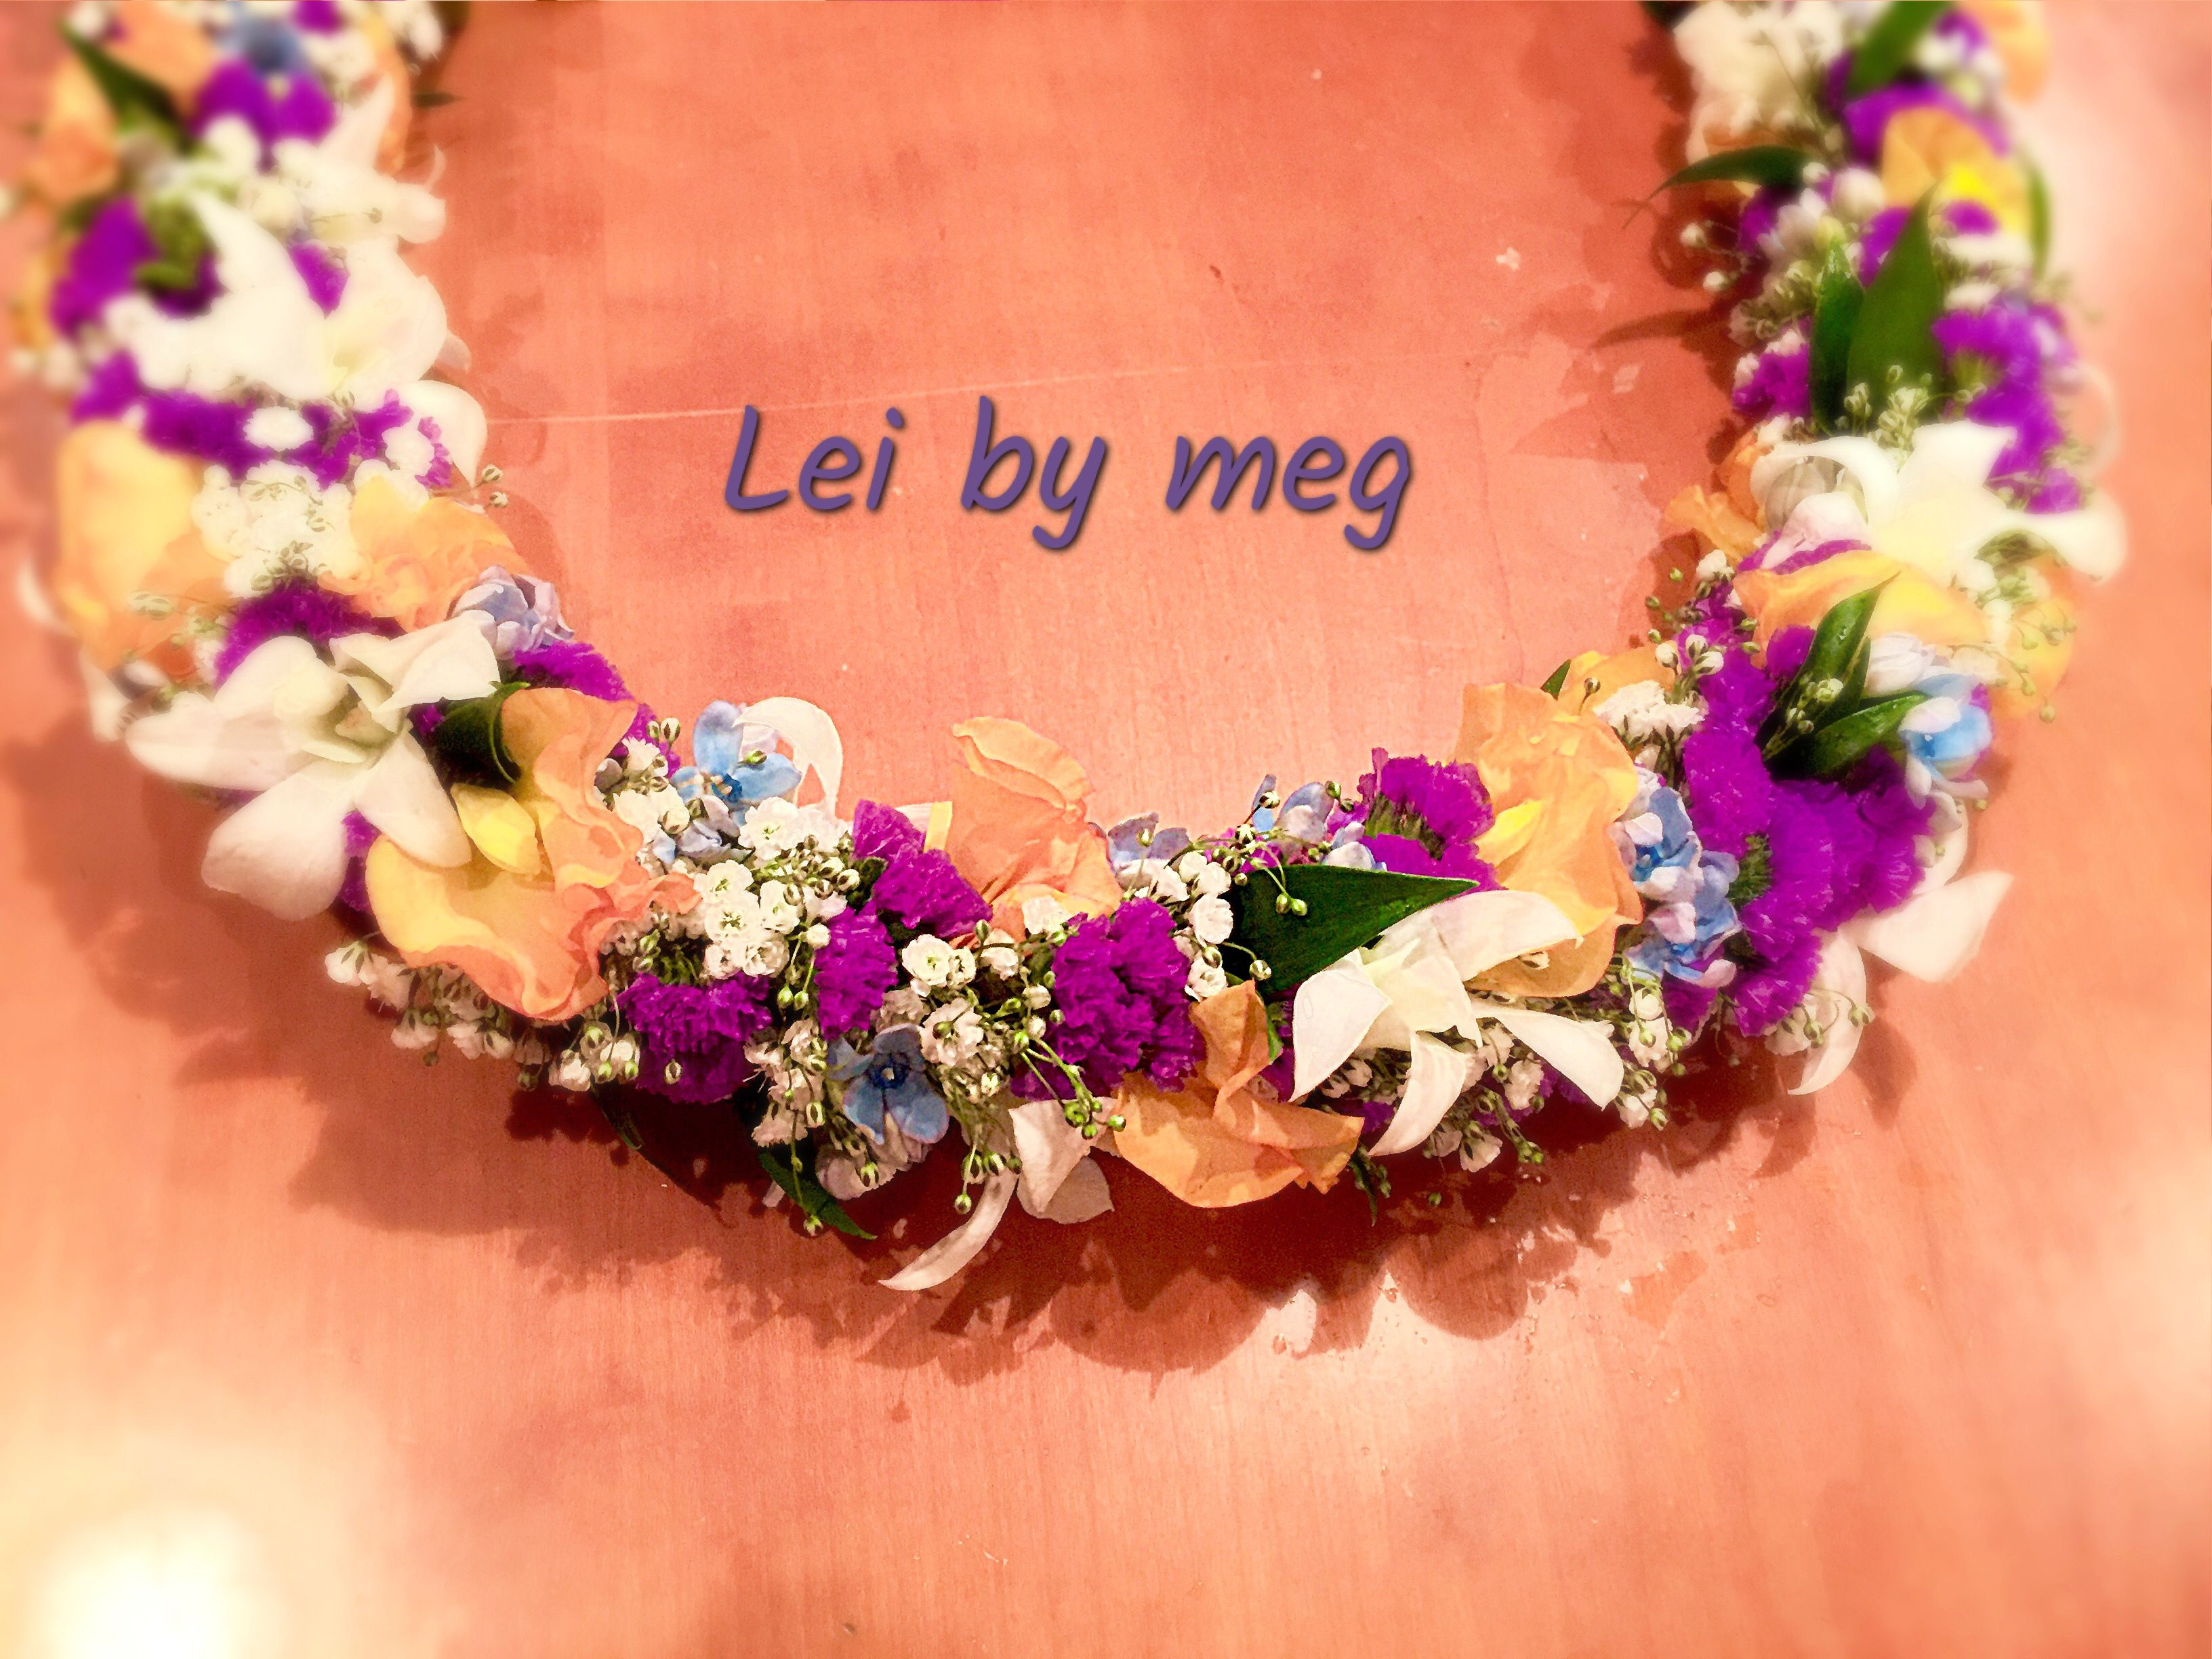 Pin by meg matsuyama on hawaiian fresh flower lei pinterest leis flower lei leis fresh flowers hawaiian garlands floral wreath izmirmasajfo